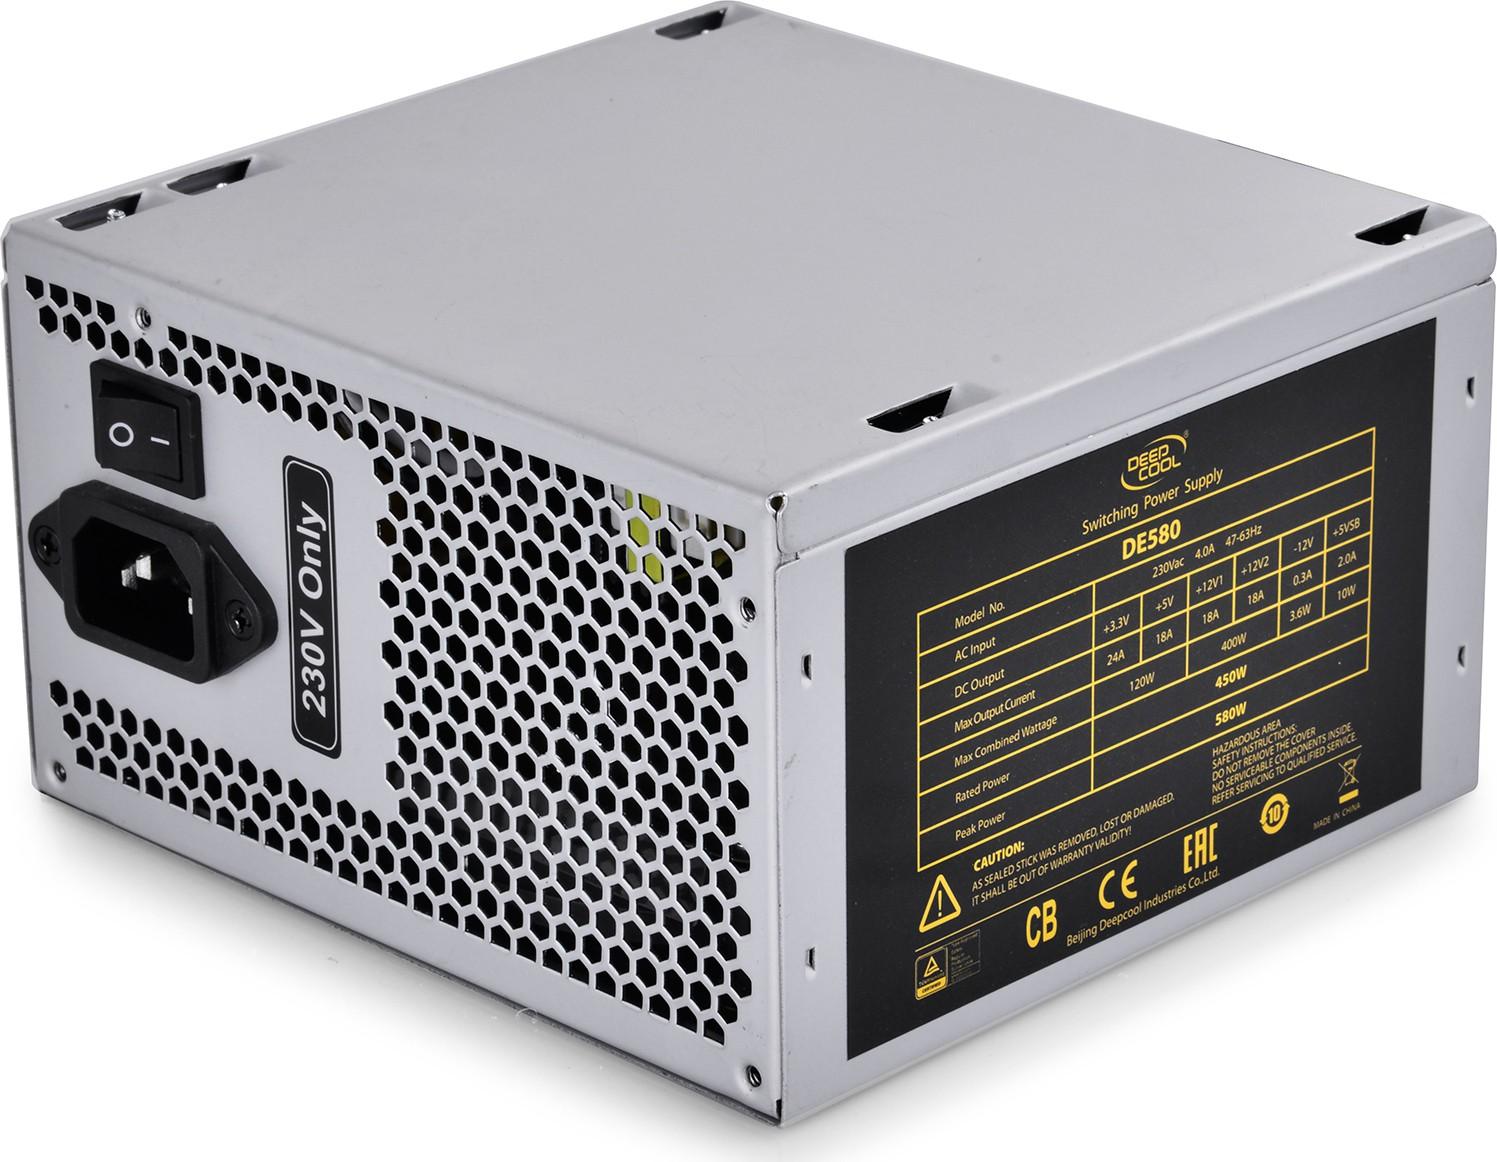 Deepcool Explorer Series DE580 580 Watts PSU